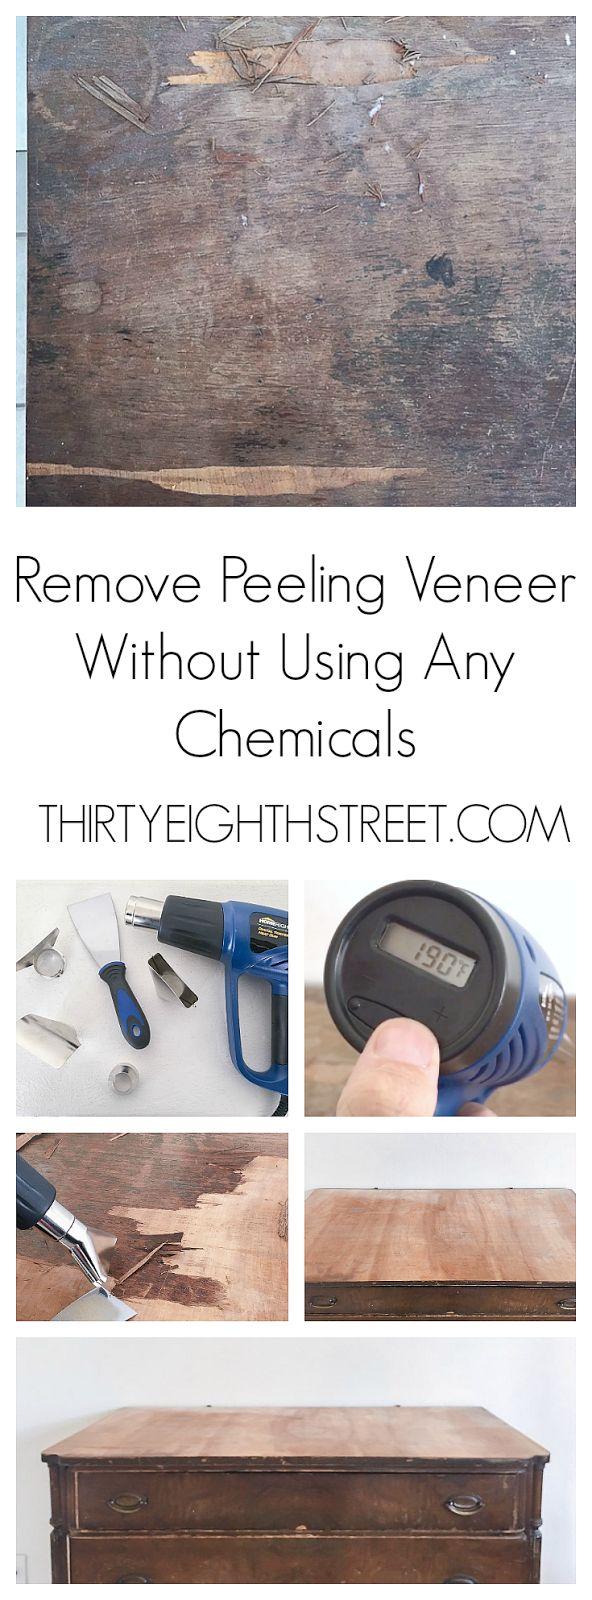 how to use a heat gun, how to remove veneer, craft heat gun, portable heat gun, repairing veneer, taking off veneer, best heat gun, heat gun uses, remove veneer quick and easy